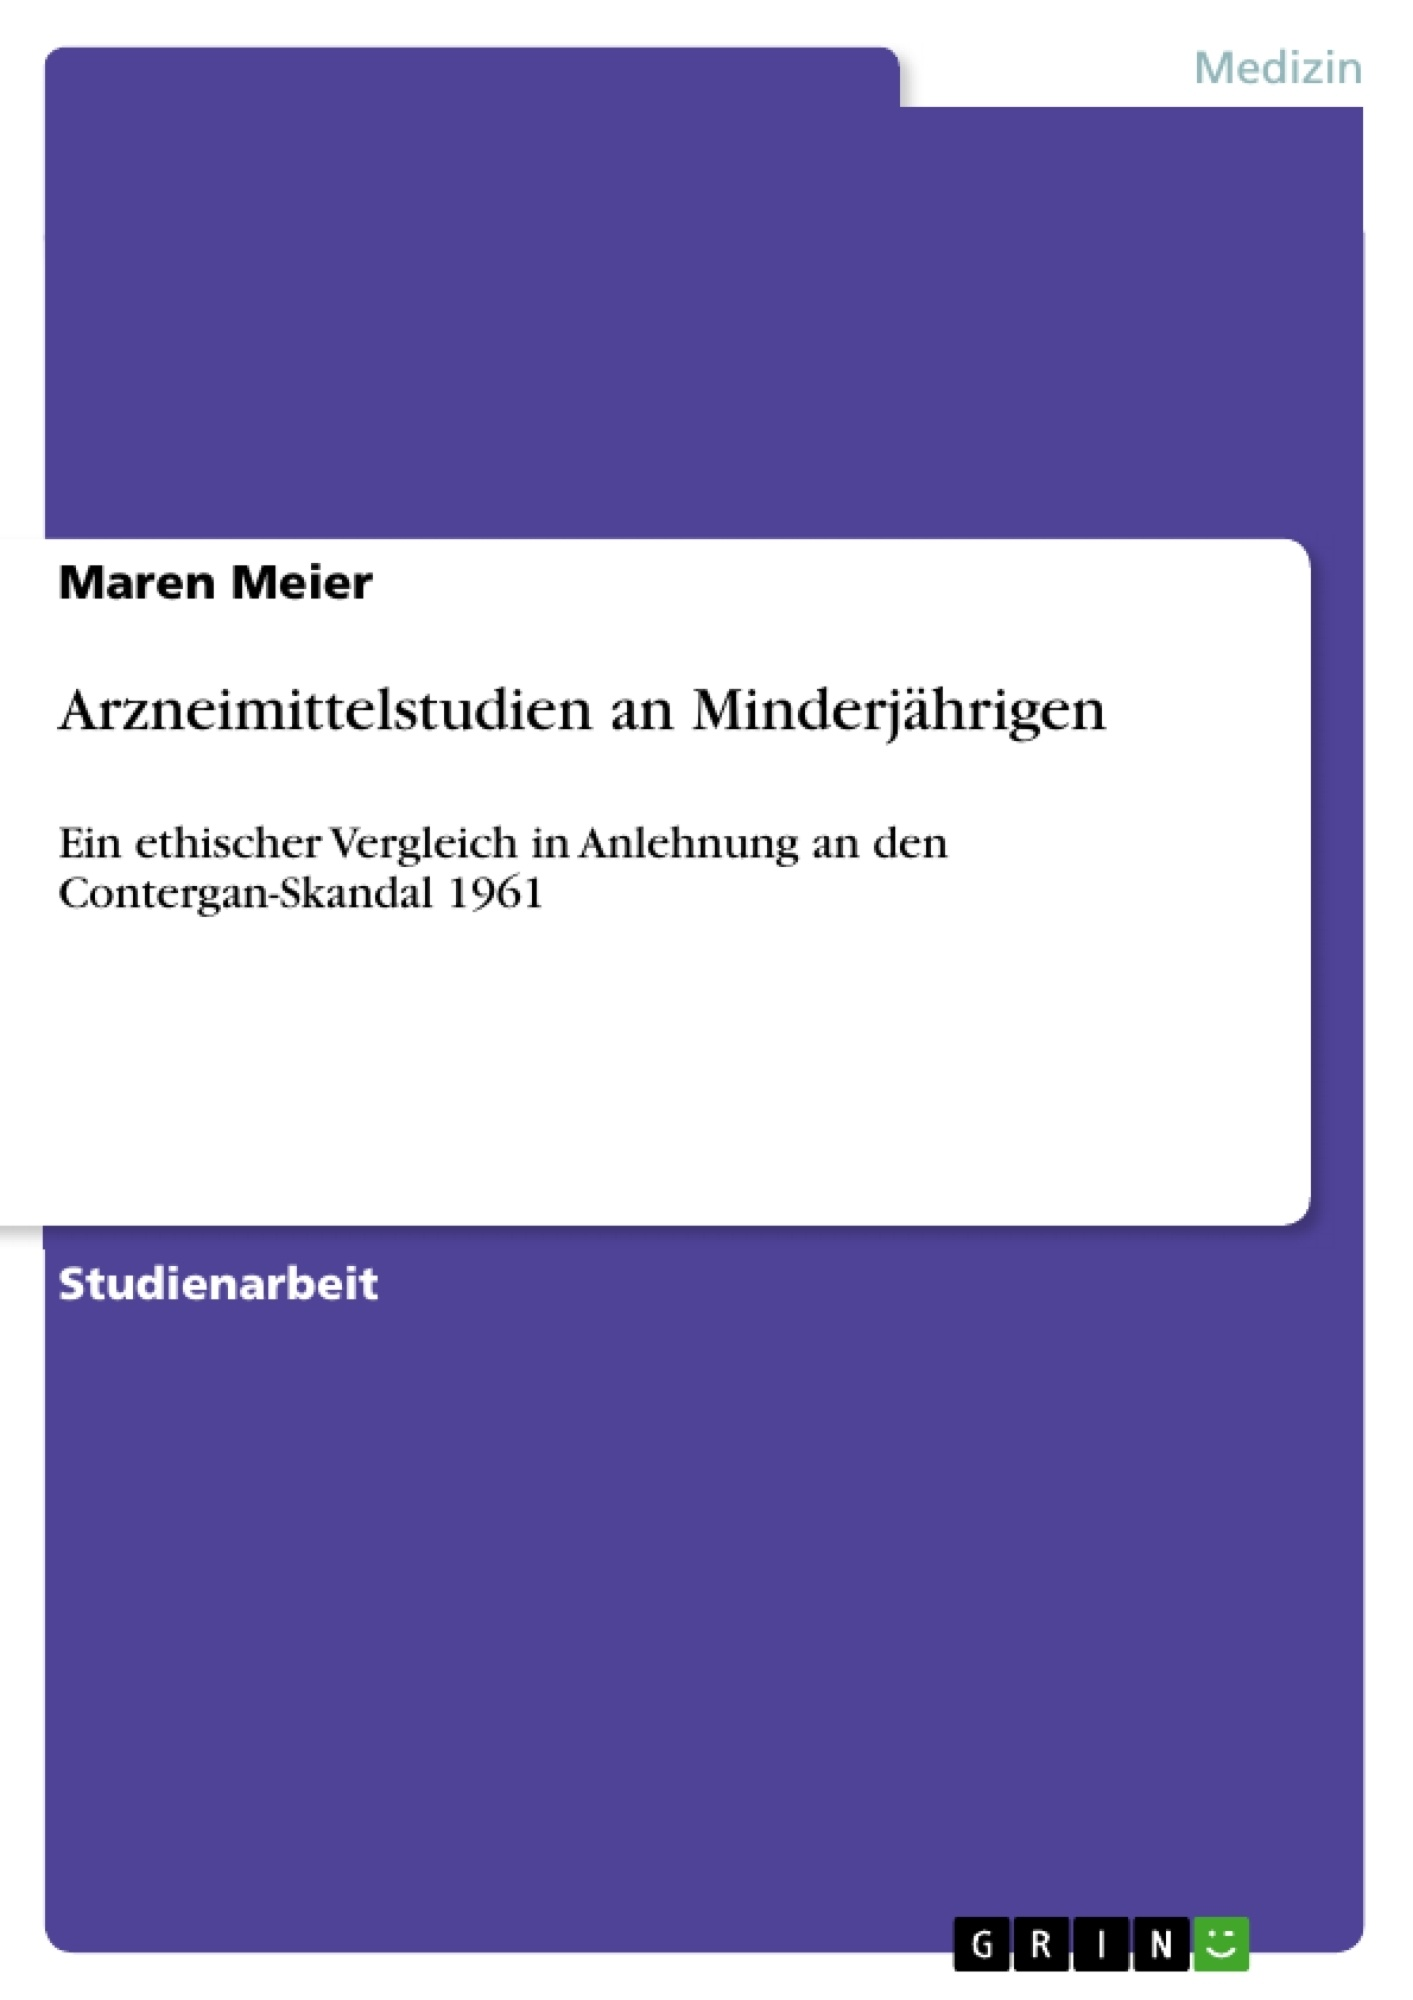 Titel: Arzneimittelstudien an Minderjährigen